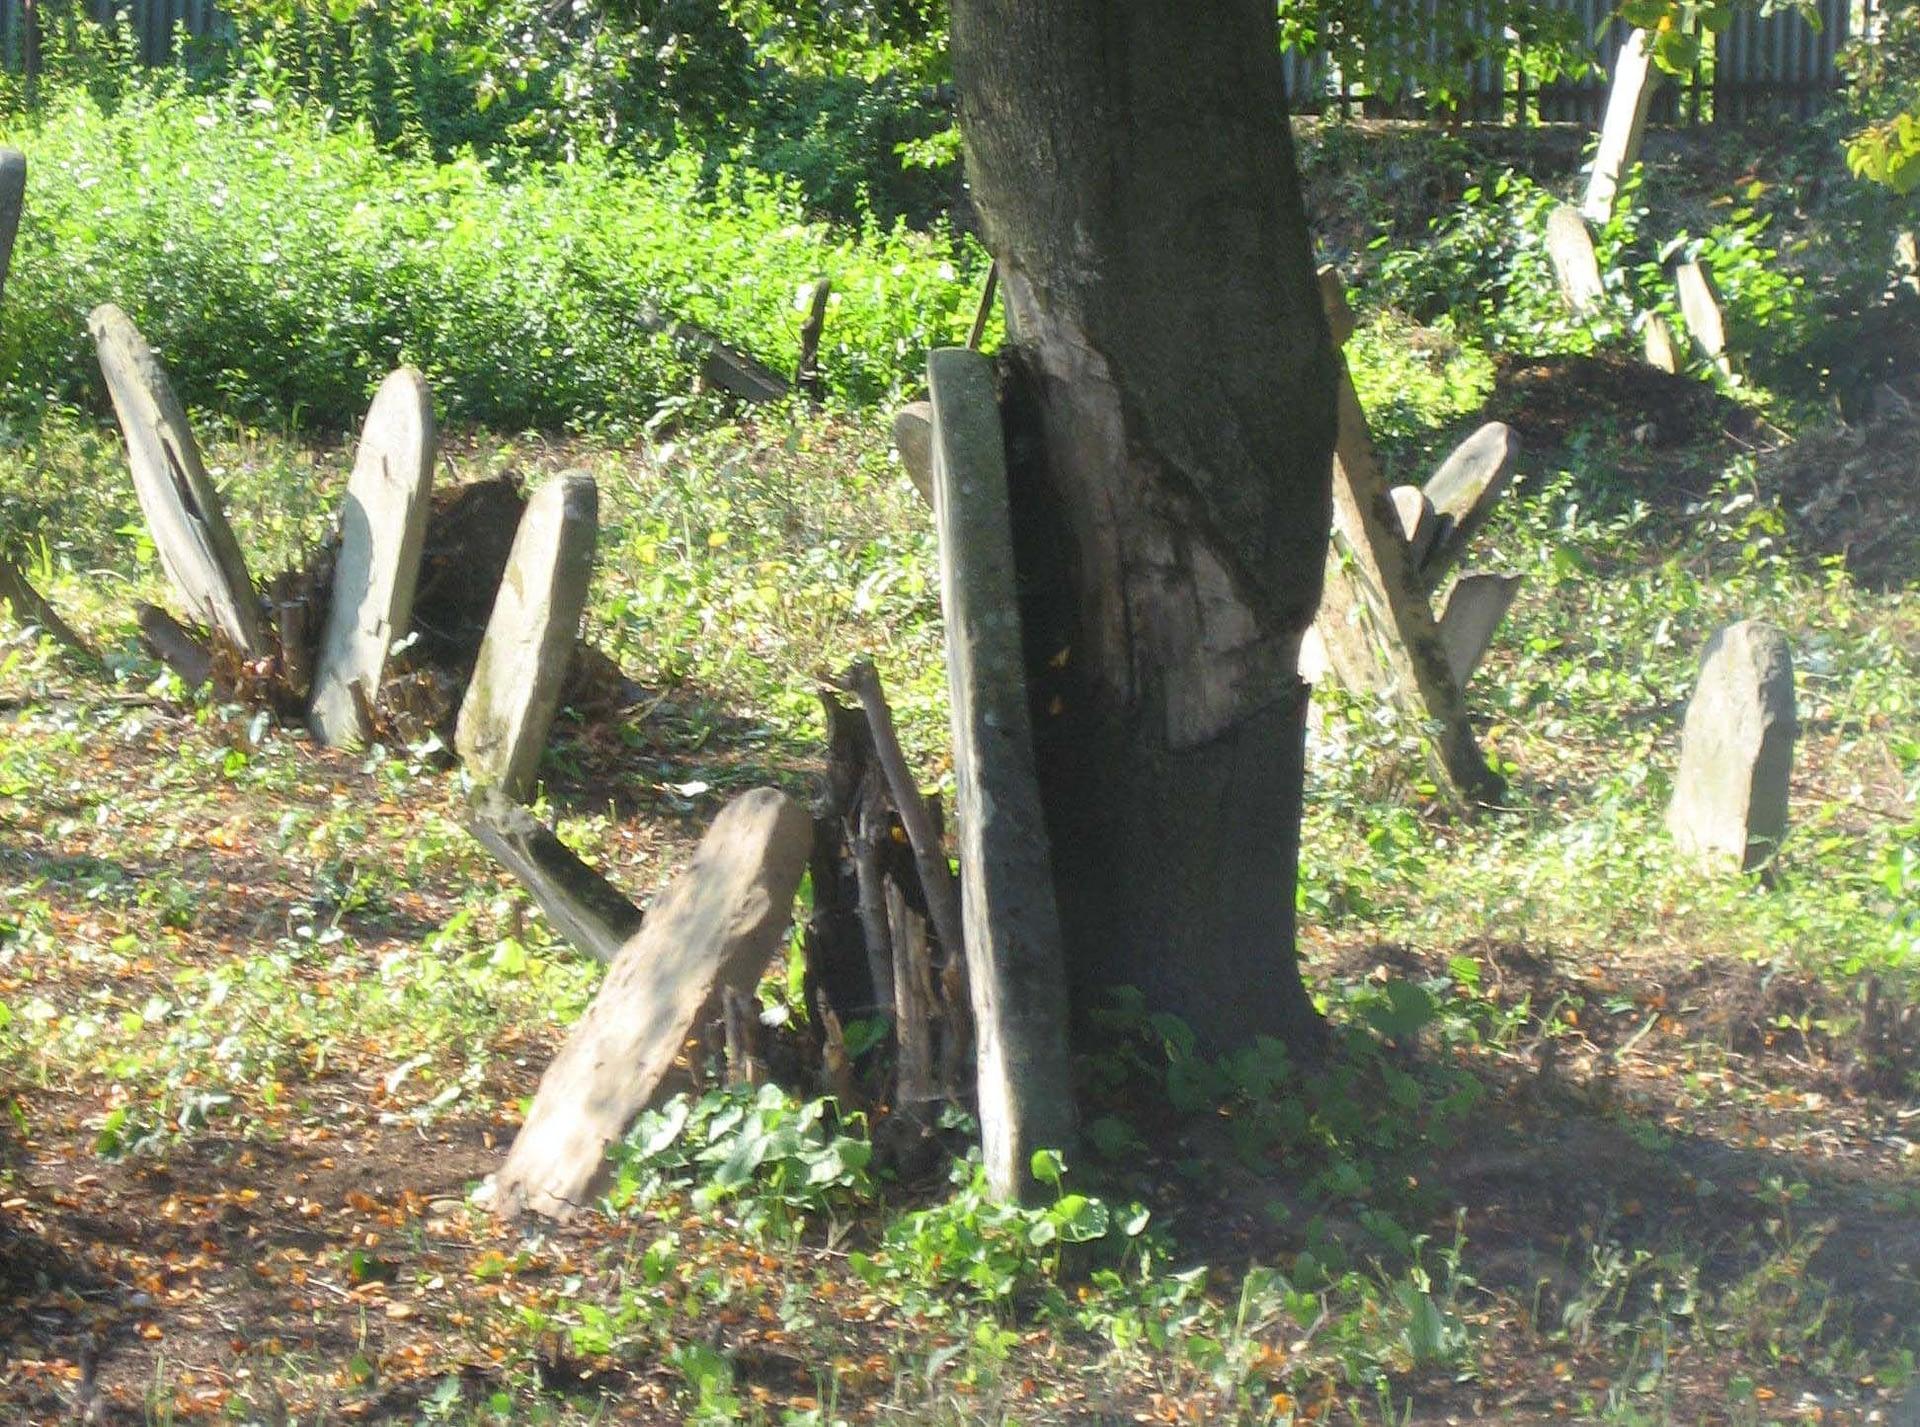 2005 - Bardejov's Jewish Cemetery before restoration